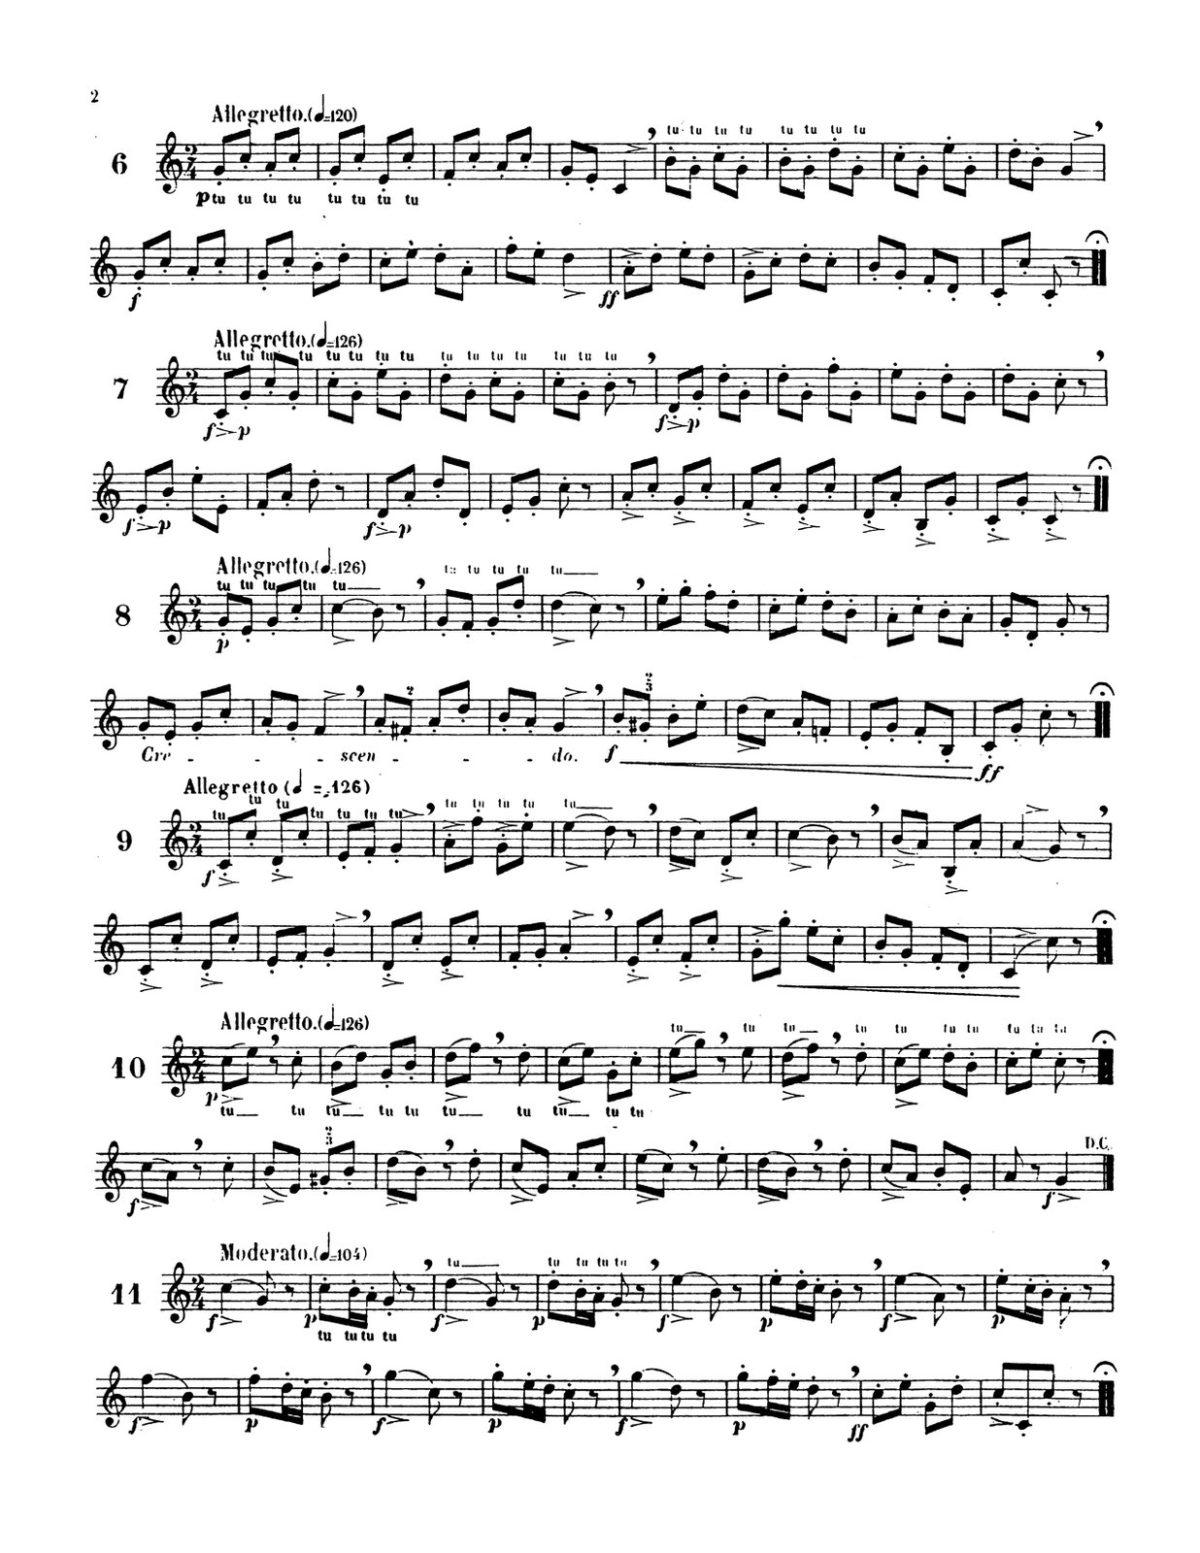 Clodomir, Modern Trumpet School 1, Little Exercises-p04